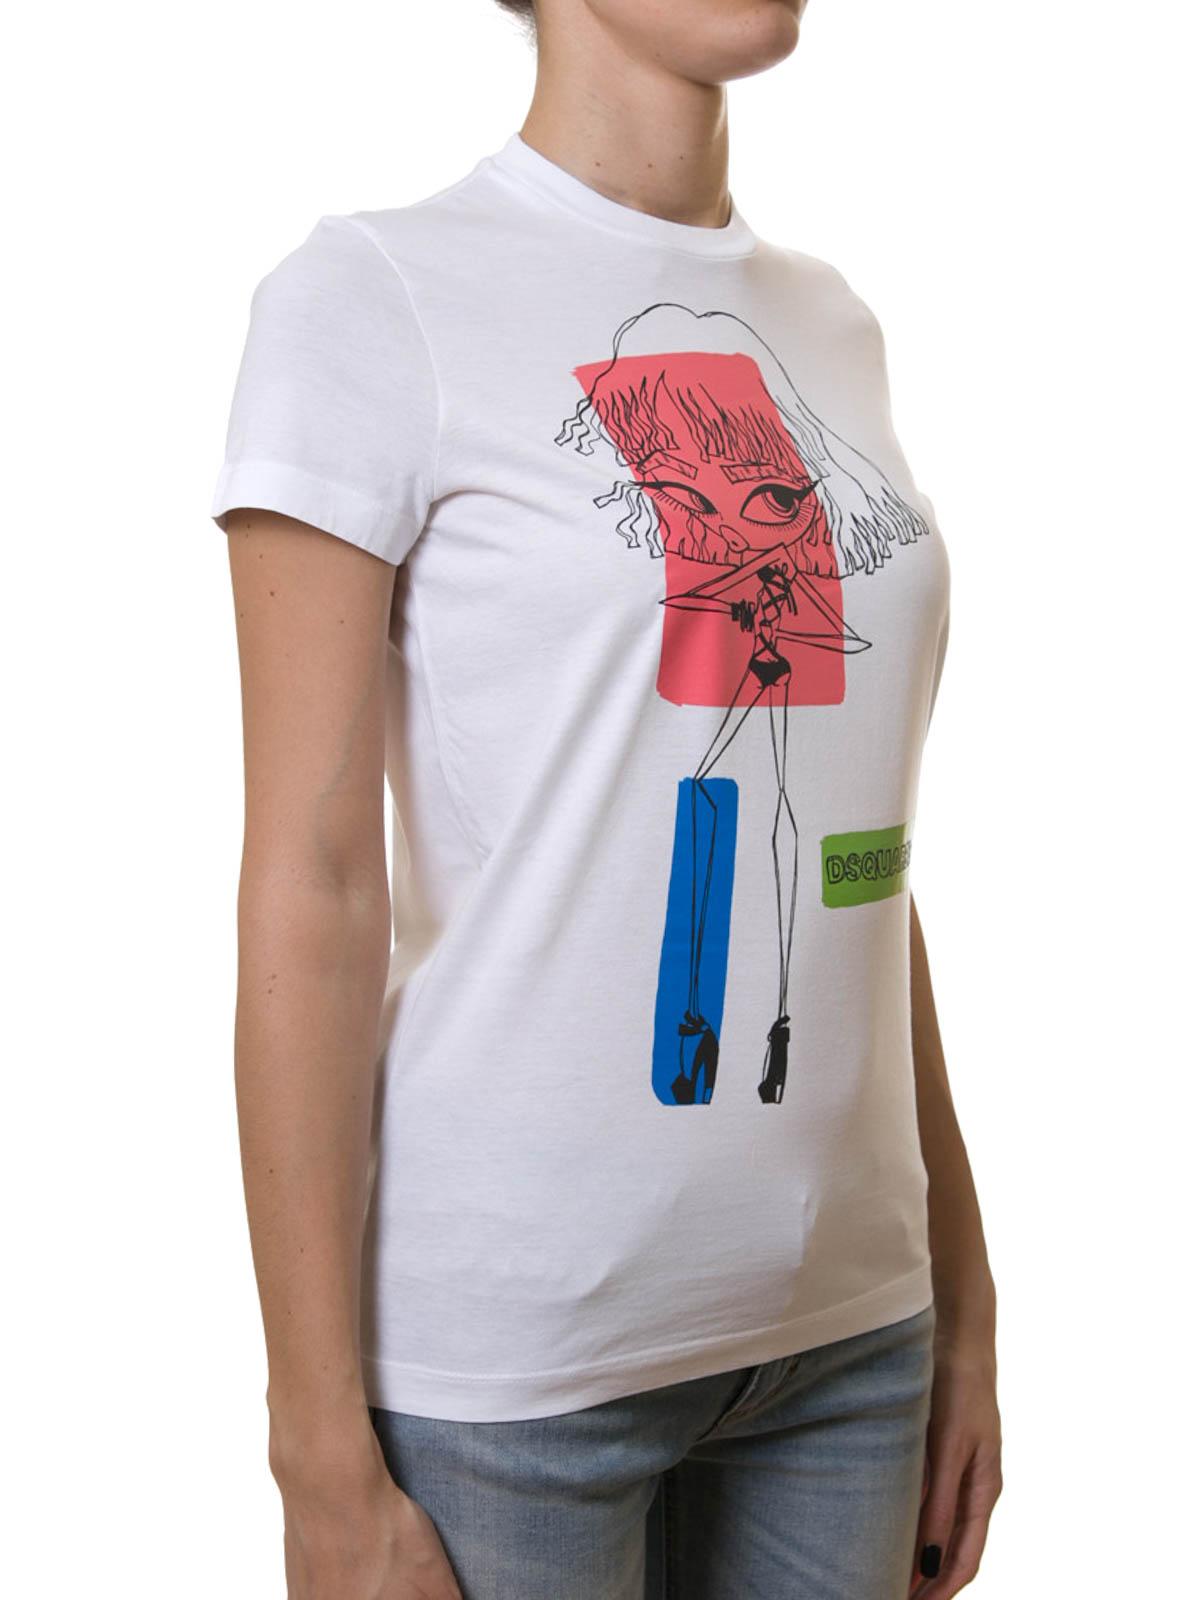 Colour block print t shirt by dsquared2 t shirts ikrix for Colour t shirt printing